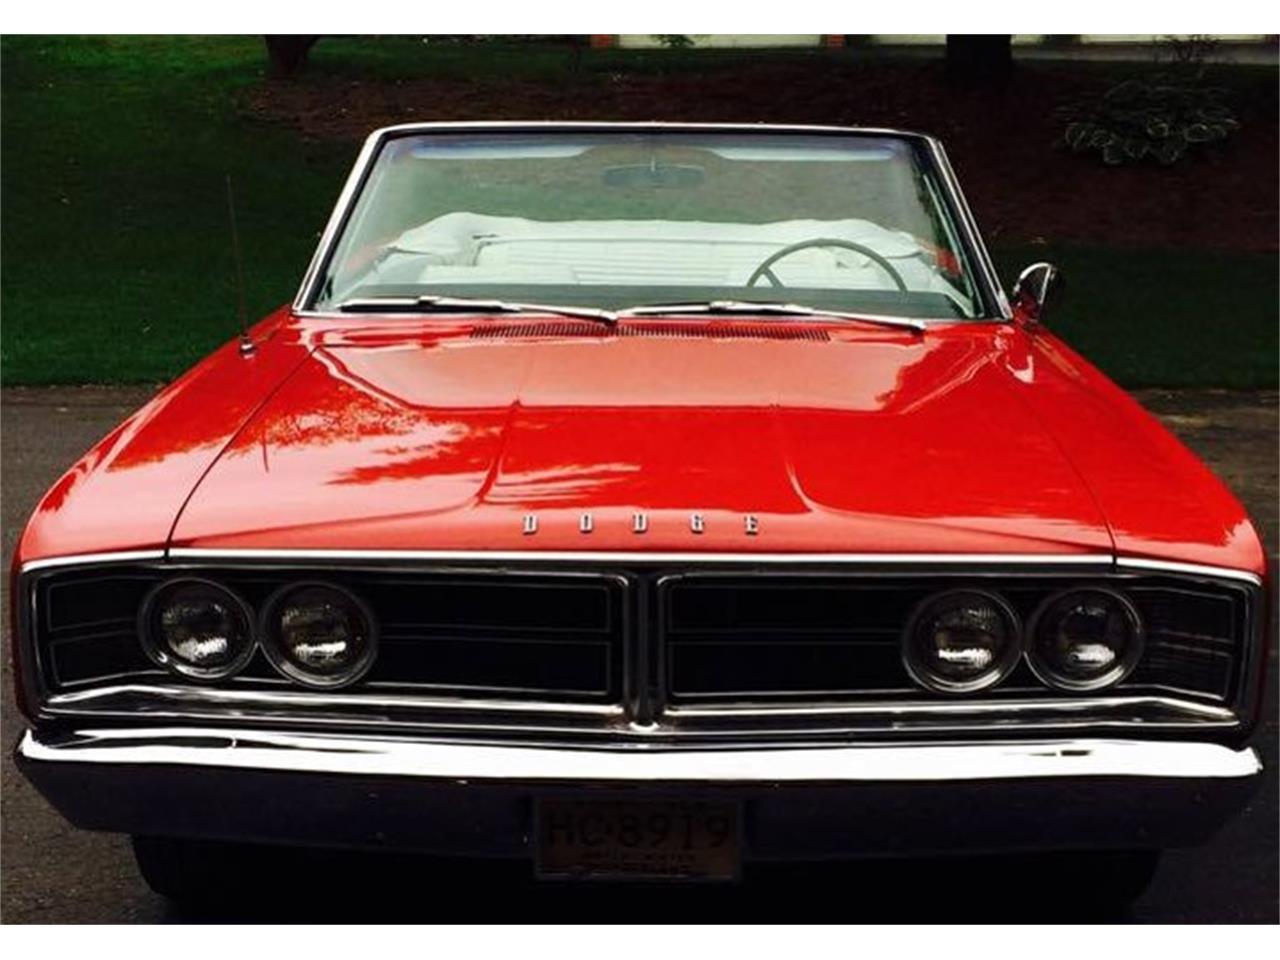 1966 Dodge Coronet Wiring Schematics Detailed Diagram Schematic Electrical Diagrams 500 Hemi 1965